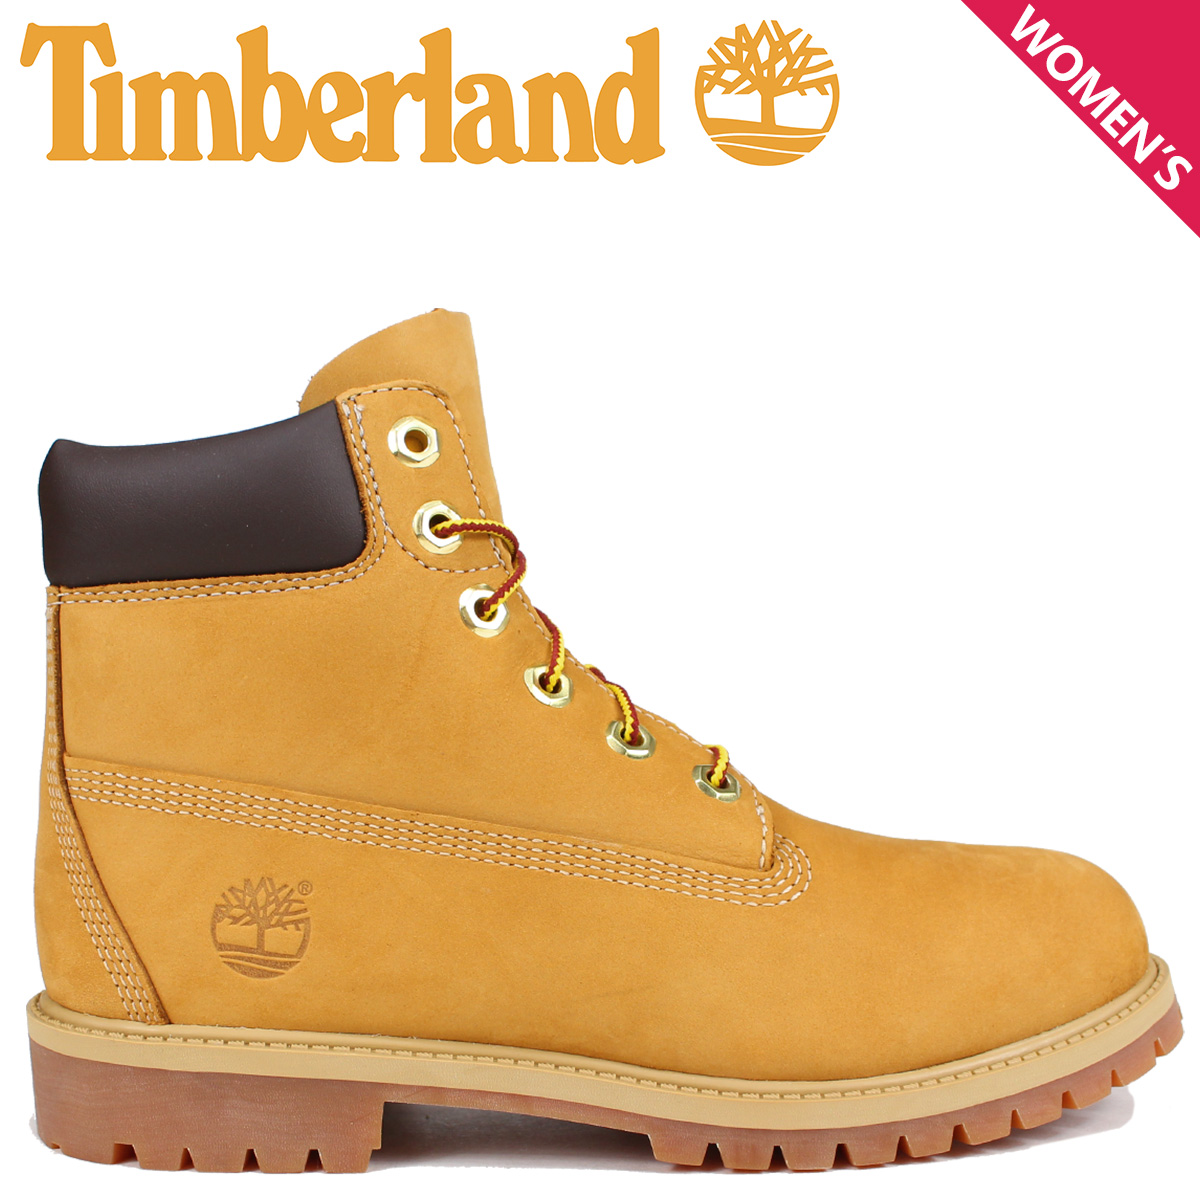 Timberland レディース ブーツ 6インチ ティンバーランド JUNIOR 6INCH PREMIUM WATERPROOF BOOTS 12909 プレミアム ウォータープルーフ